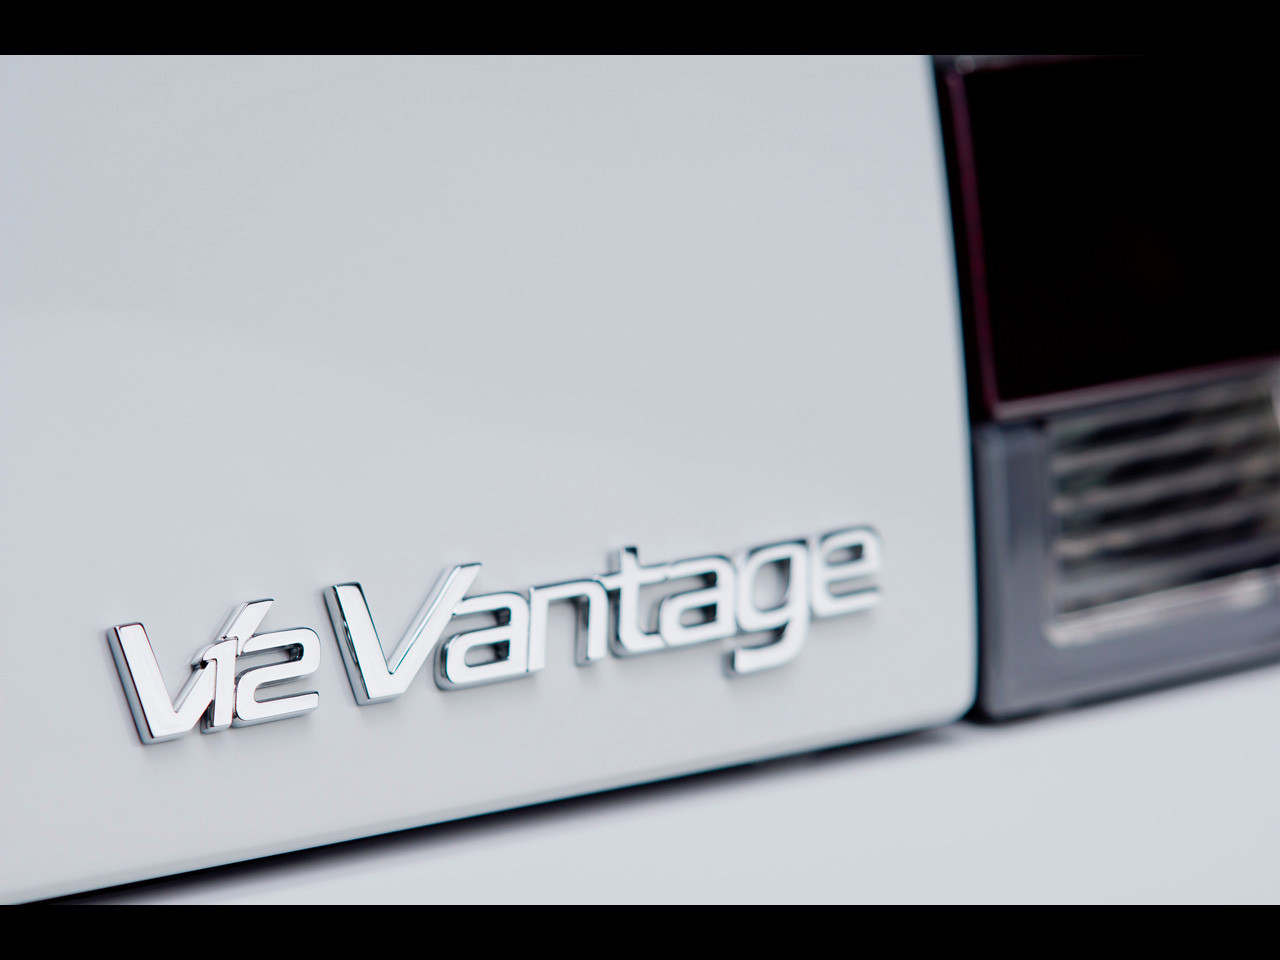 http://3.bp.blogspot.com/-2JBAA1yKgTs/UFmUNk5vBGI/AAAAAAAAAQ0/4cRNusajK3E/s1600/2012-Aston-Martin-V12-Vantage-Roadster-3.jpg